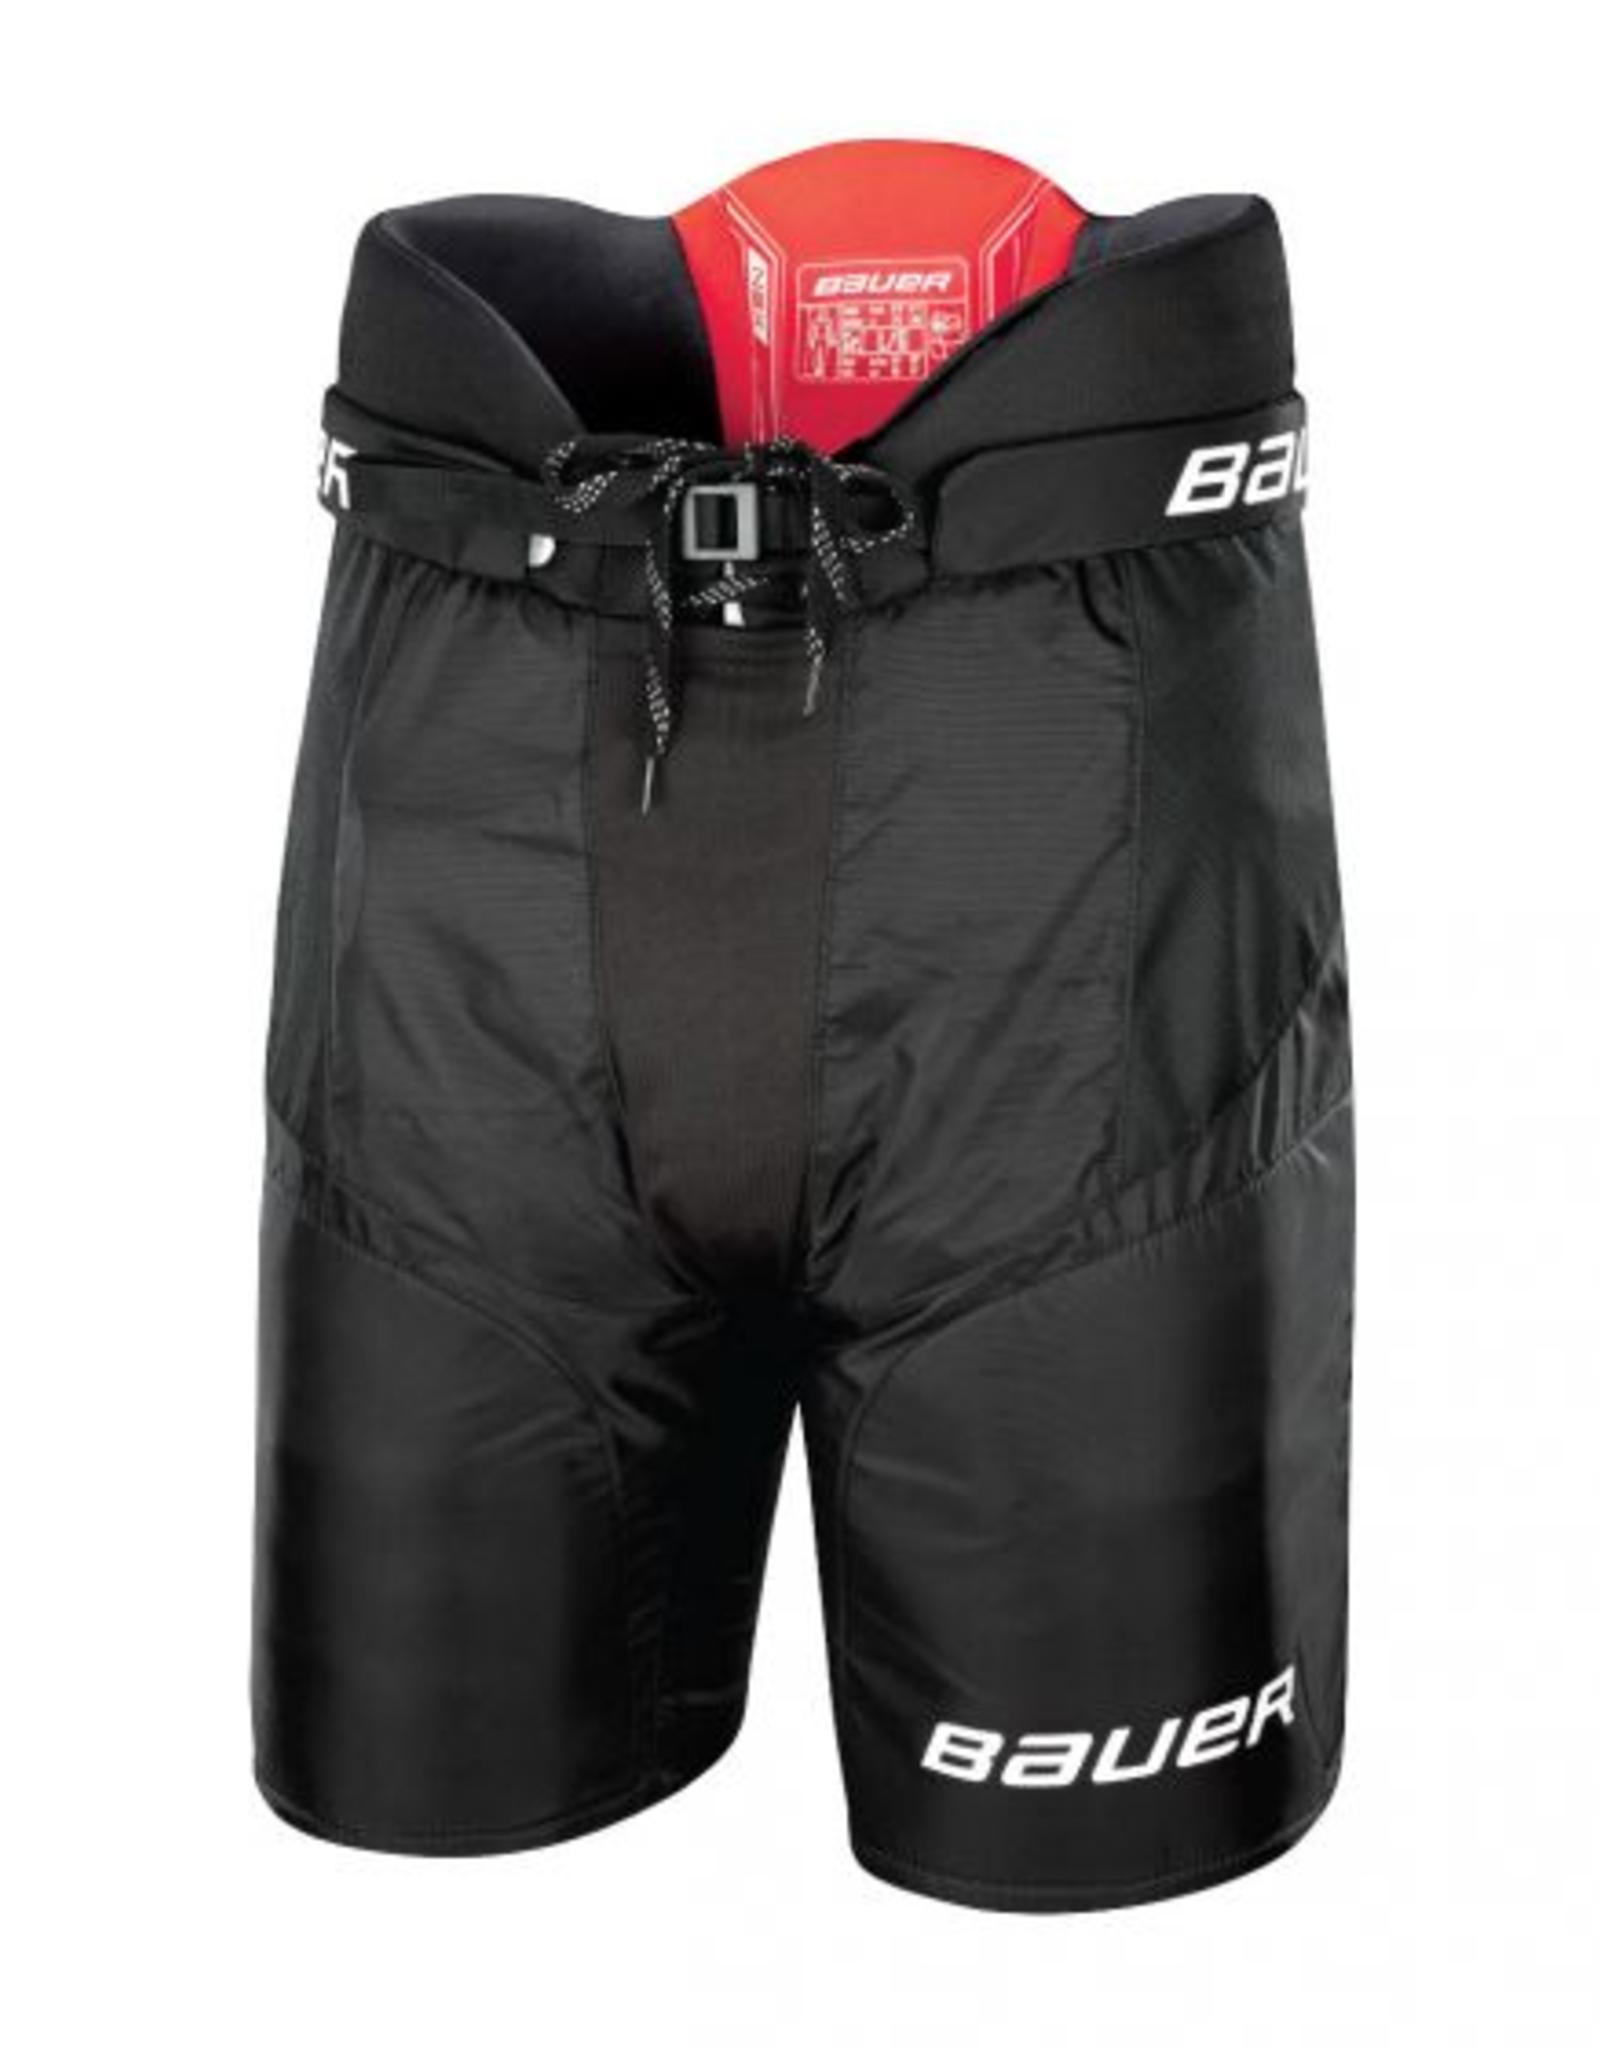 Bauer Hockey S18 BAUER NSX PANTS - SR-M-BLK